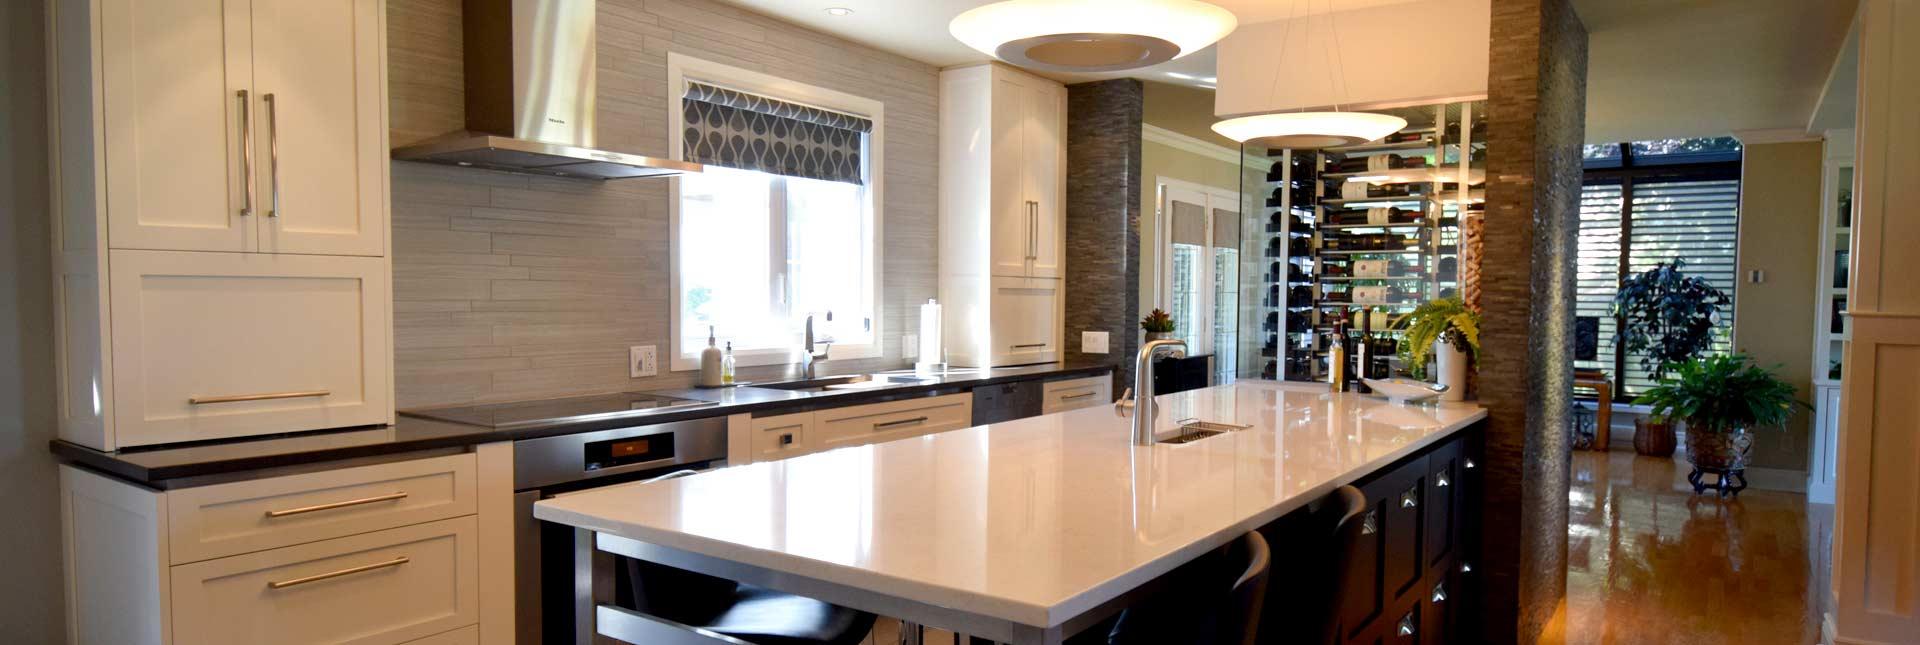 cuisine et cellier la bo te design. Black Bedroom Furniture Sets. Home Design Ideas